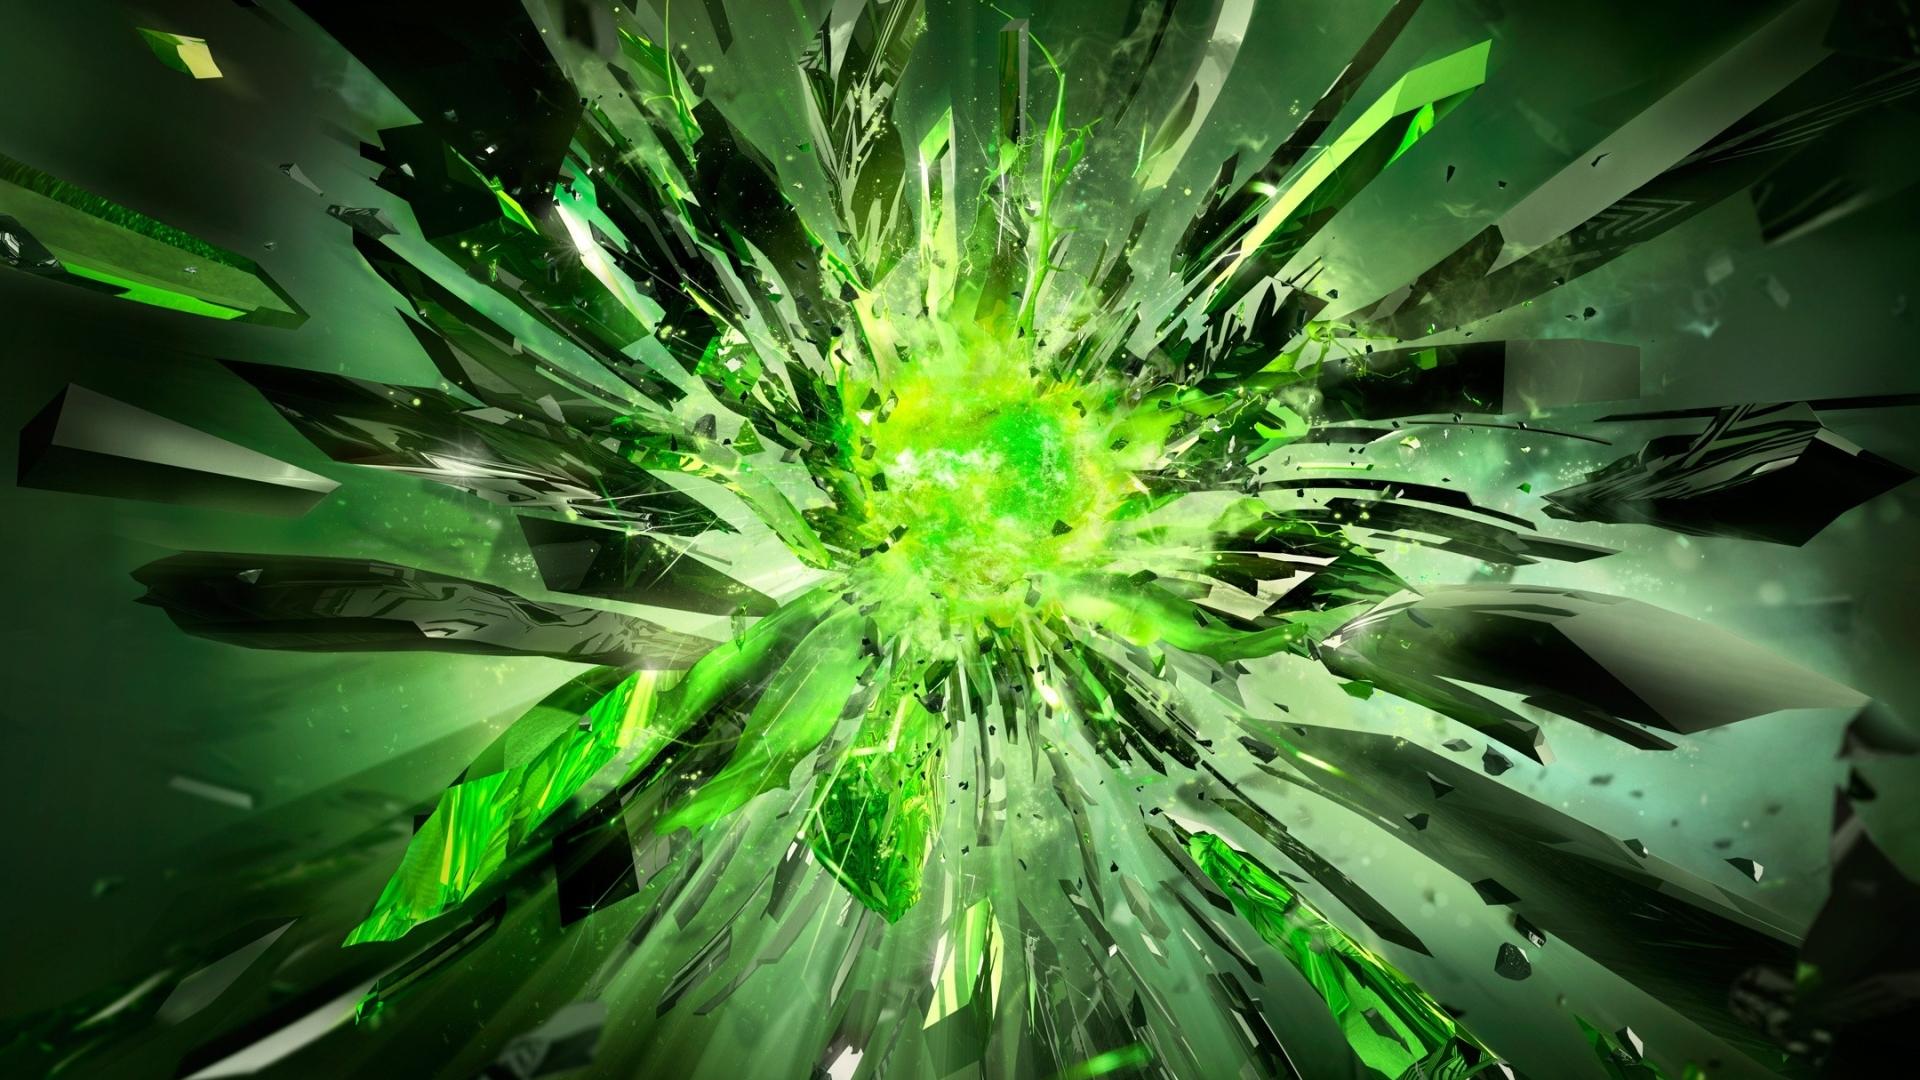 Sunlight Digital Art Abstract Grass Green Crystal Explosion Cannabis Light Tree Leaf Flower Plant Computer Wallpaper